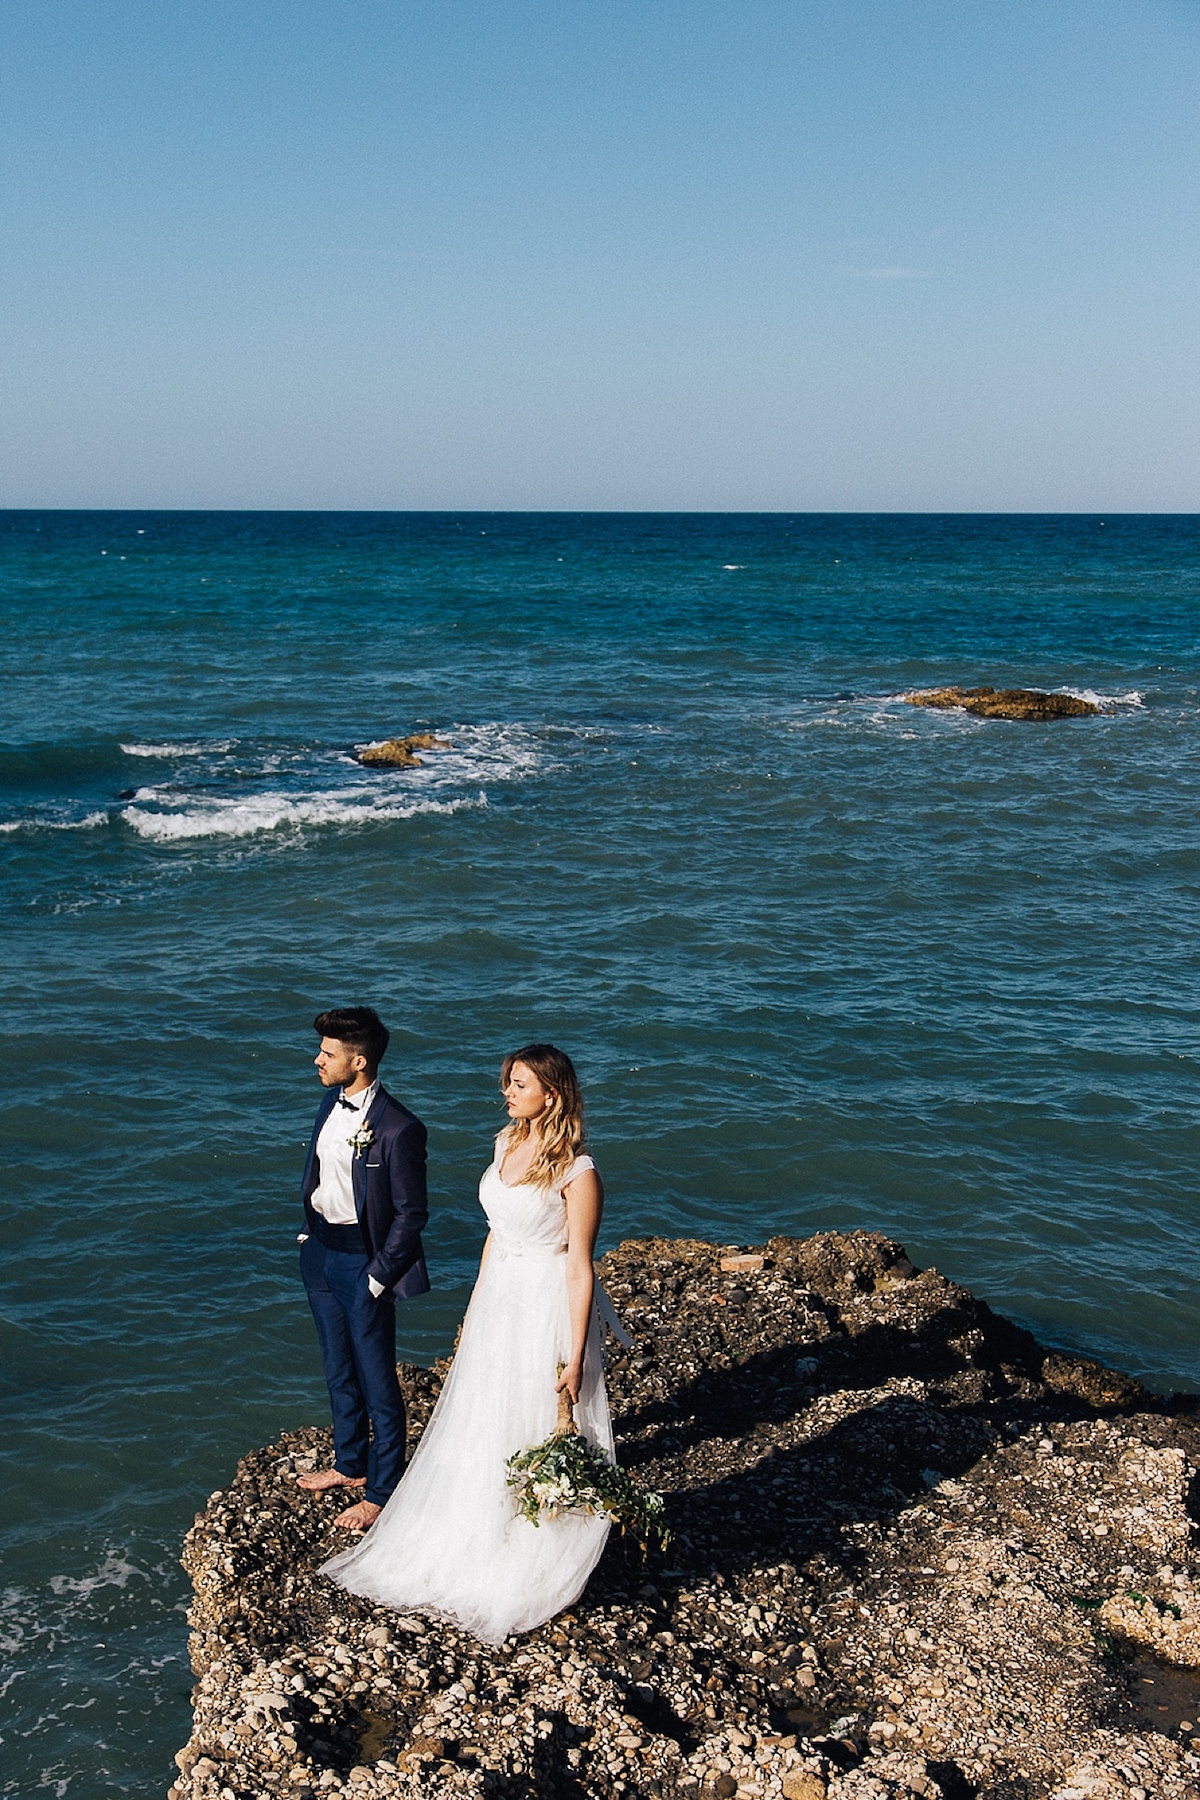 Matrimonio Sul Mare Toscana : Un matrimonio organico sul mare wedding wonderland